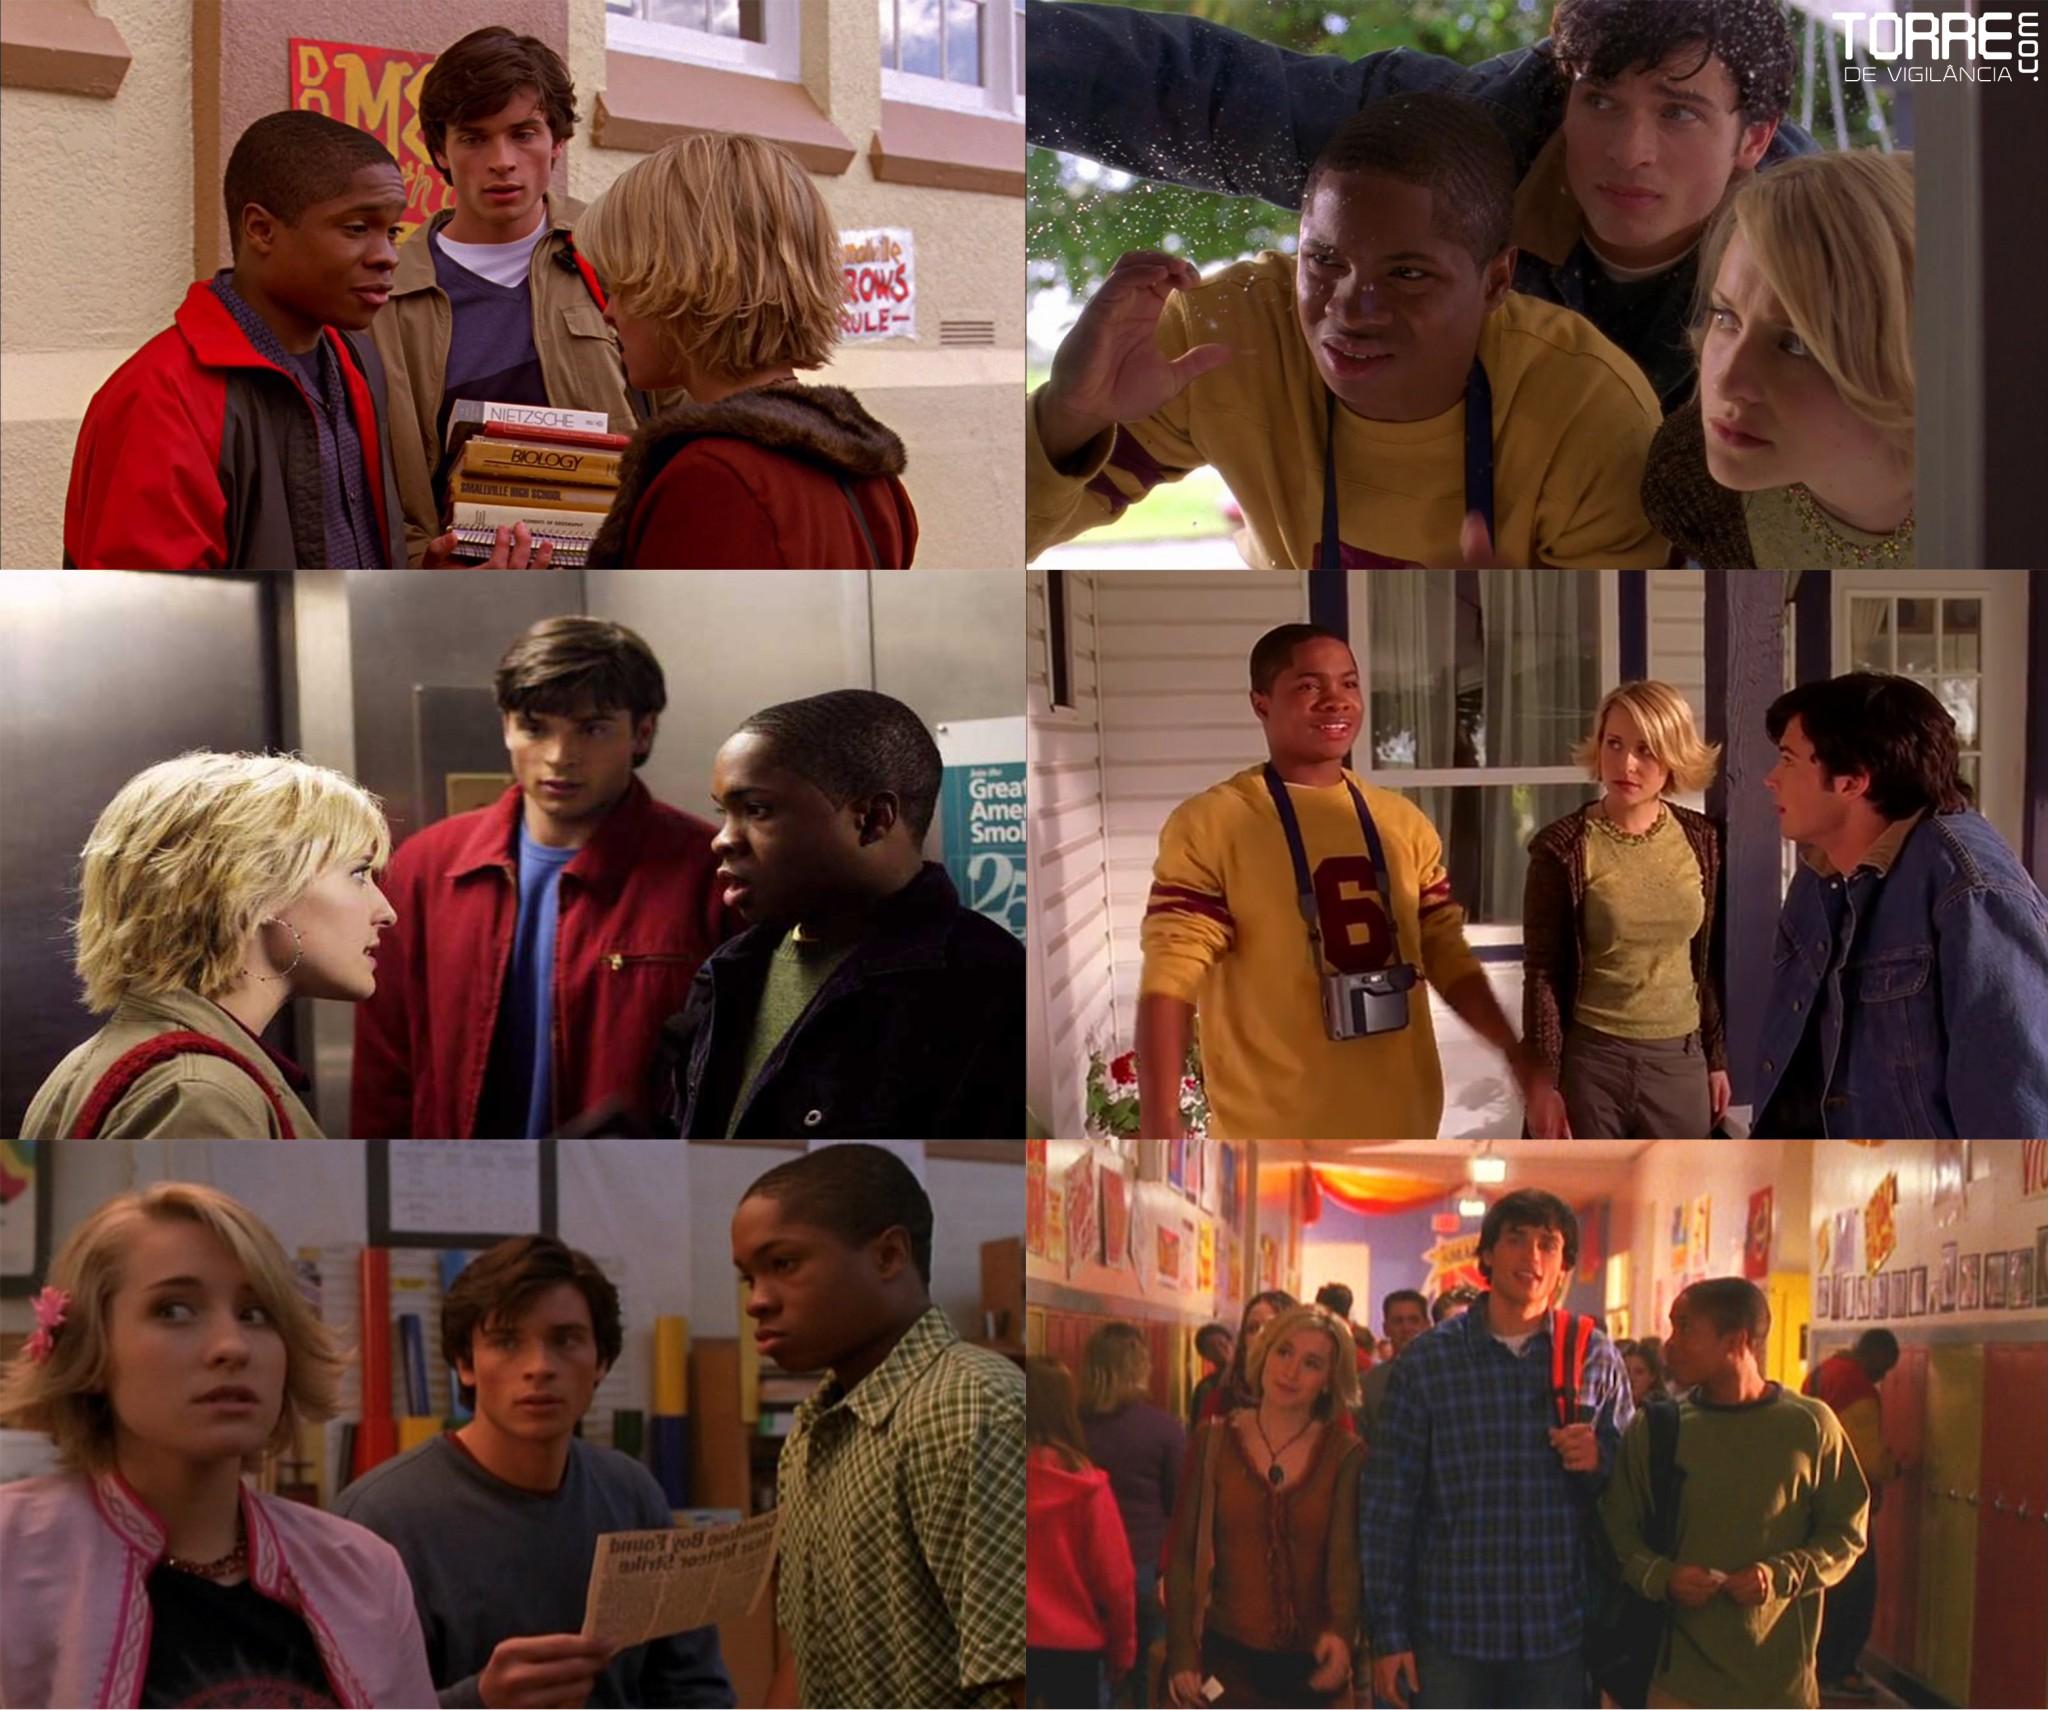 Tom Welling (Clark Kent), Allison Mack (Chloe Sullivan), e Sam Jones III (Pete Ross)